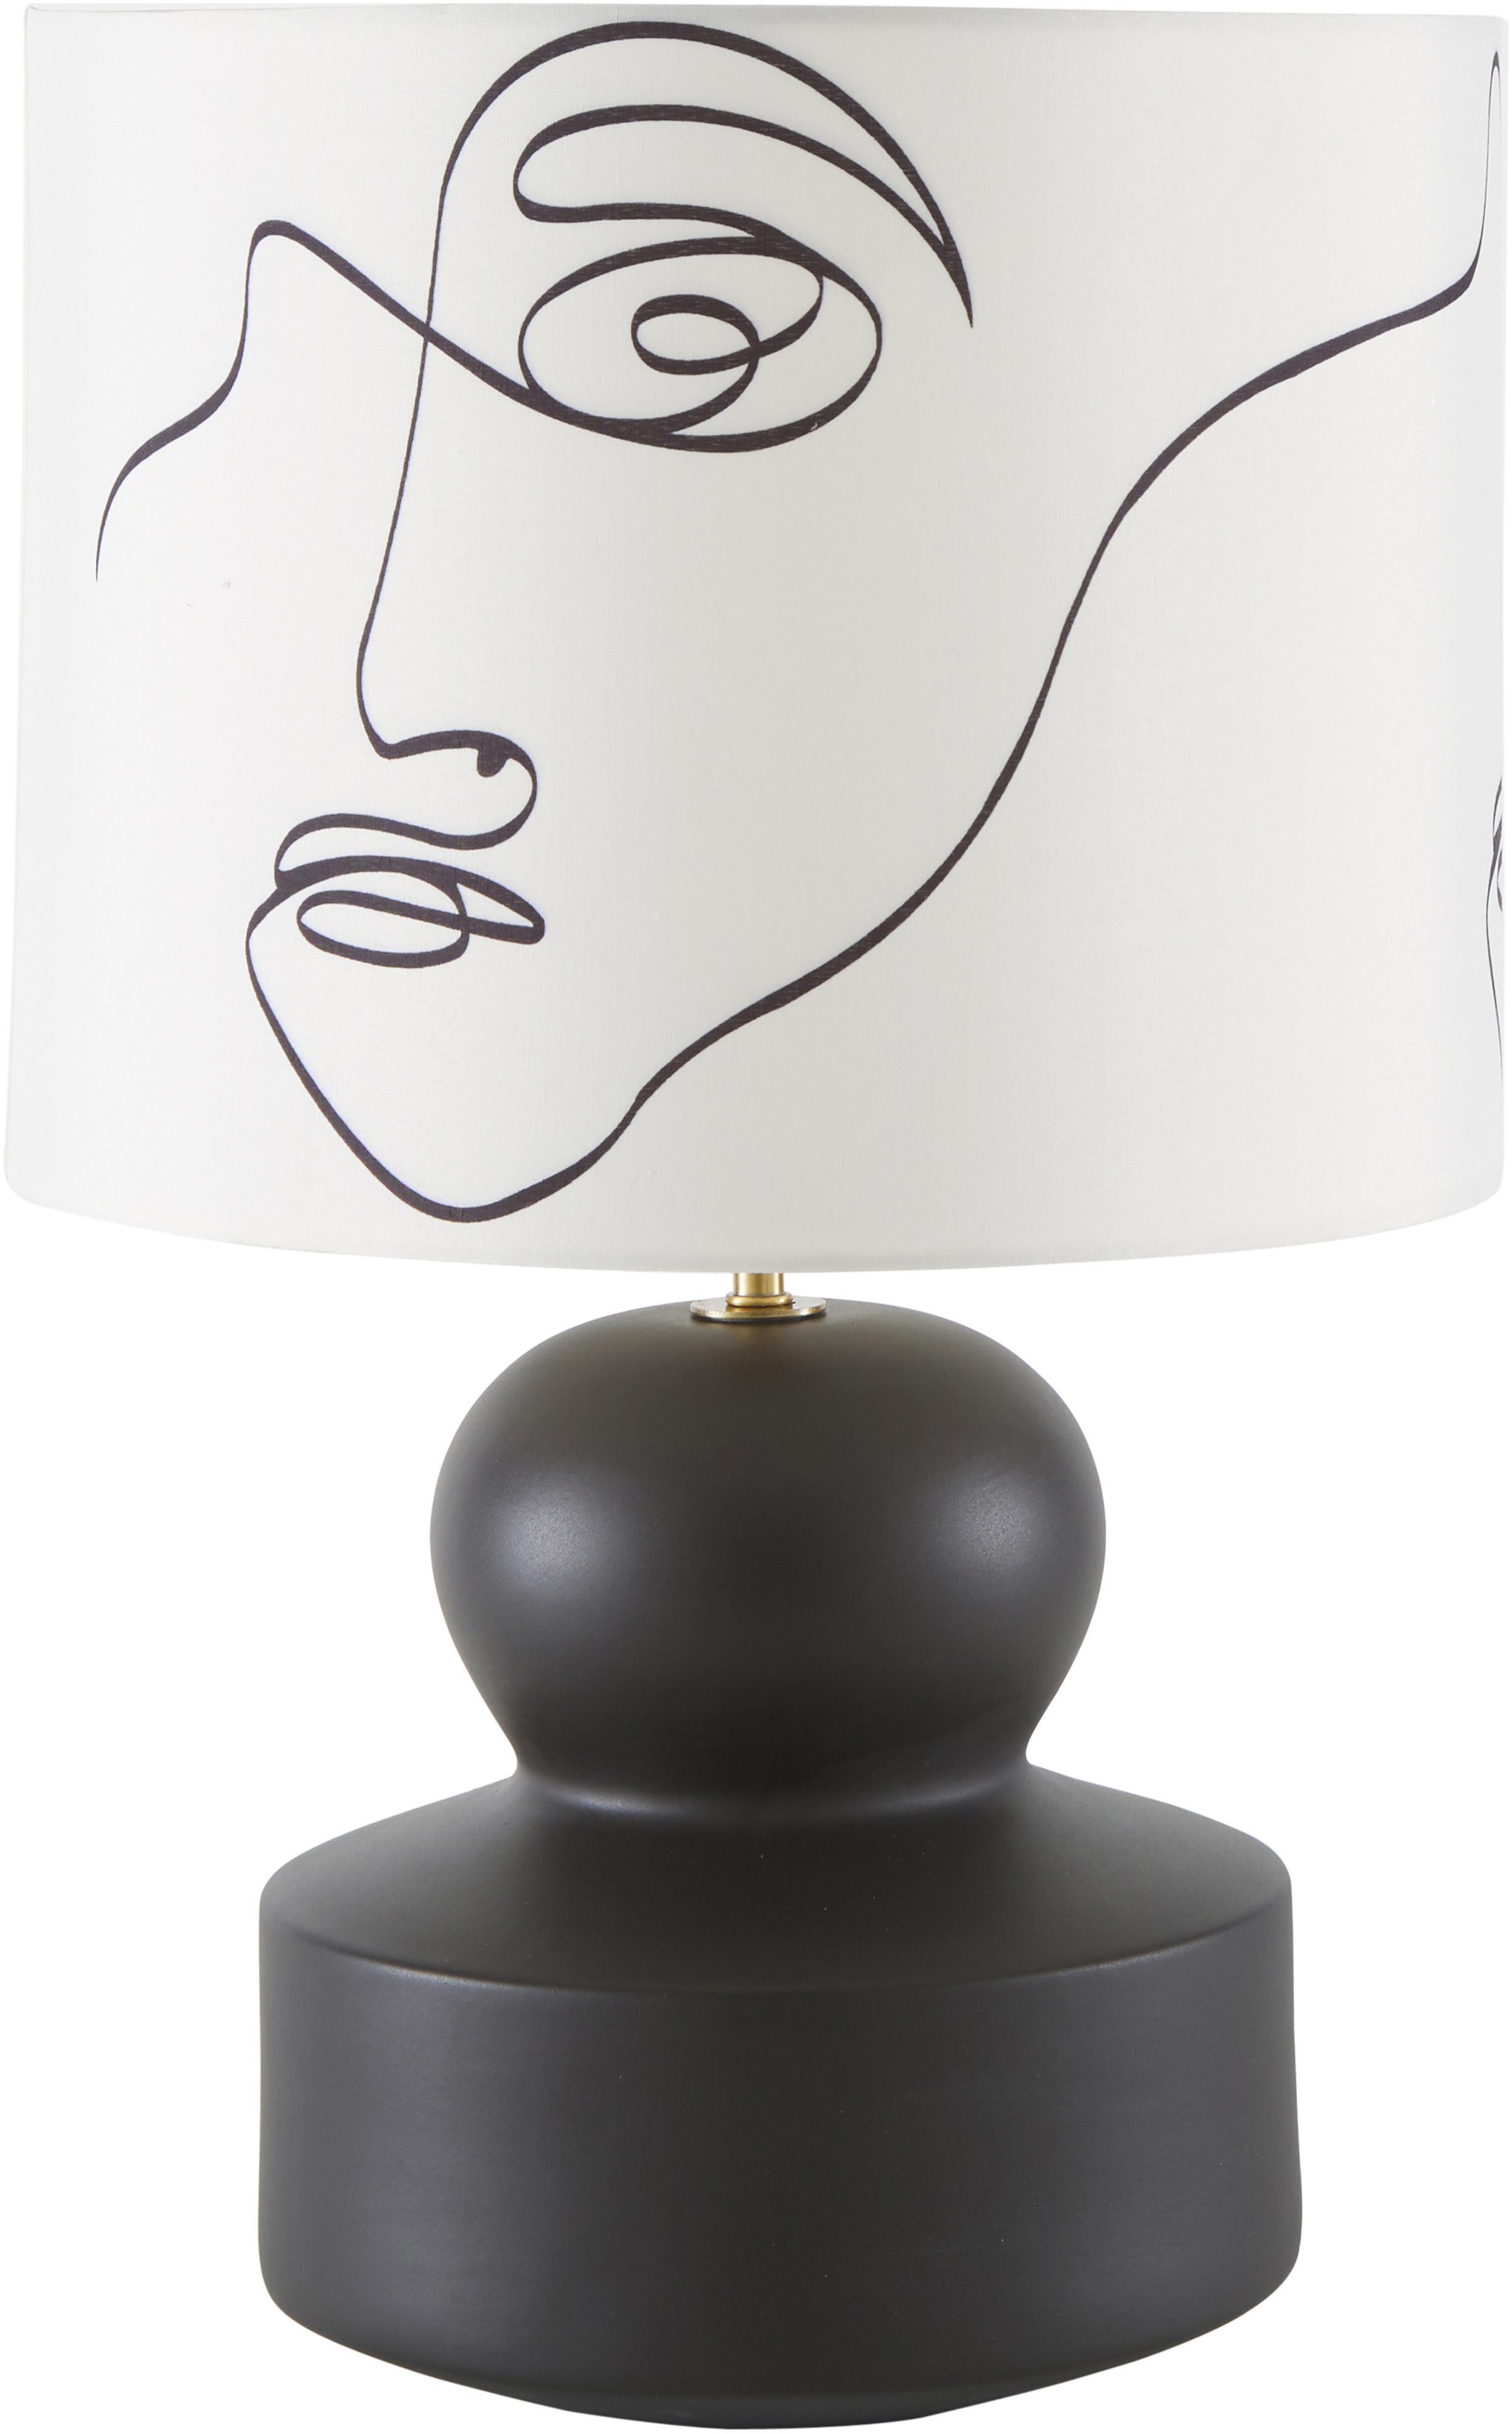 Lámpara de mesa de cerámica Georgina, Pantalla: tela, Cable: plástico, Blanco crema, negro, Ø 33 x Al 52 cm